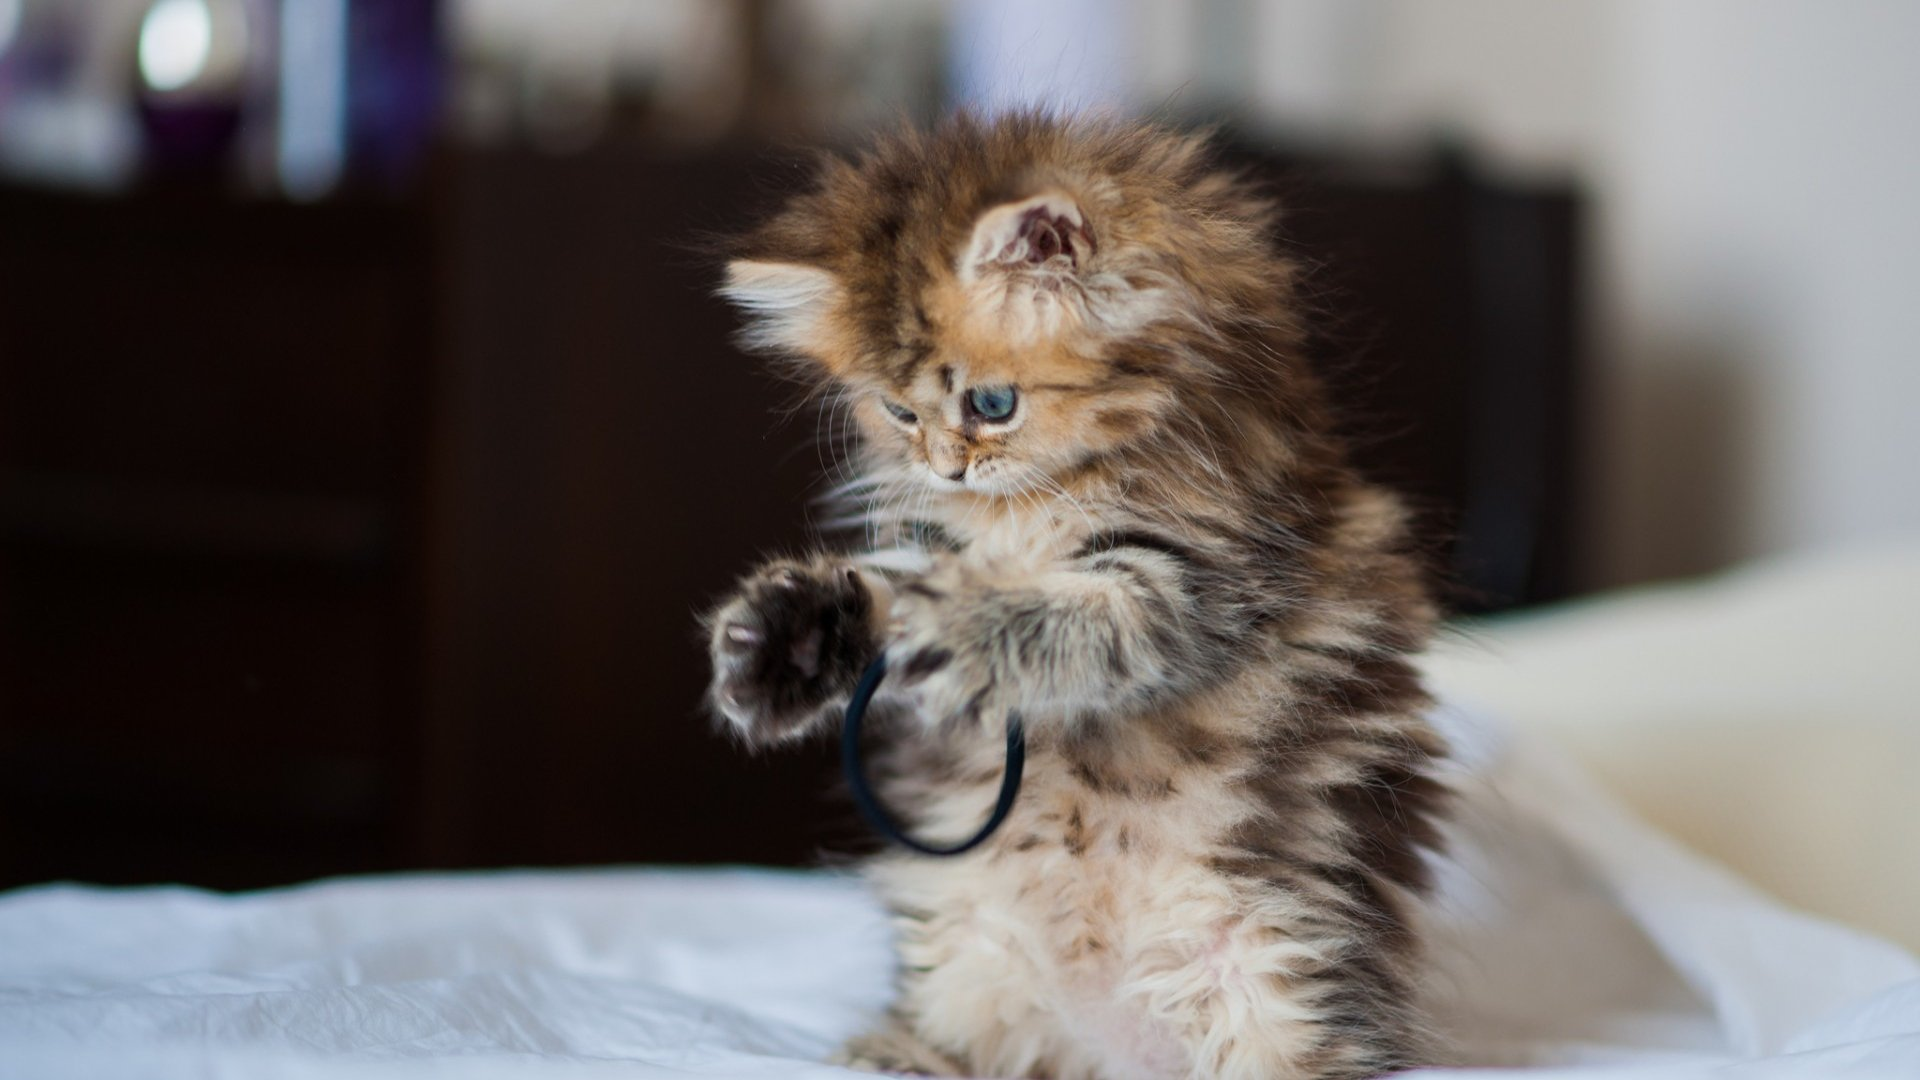 baby cat wallpaper phone